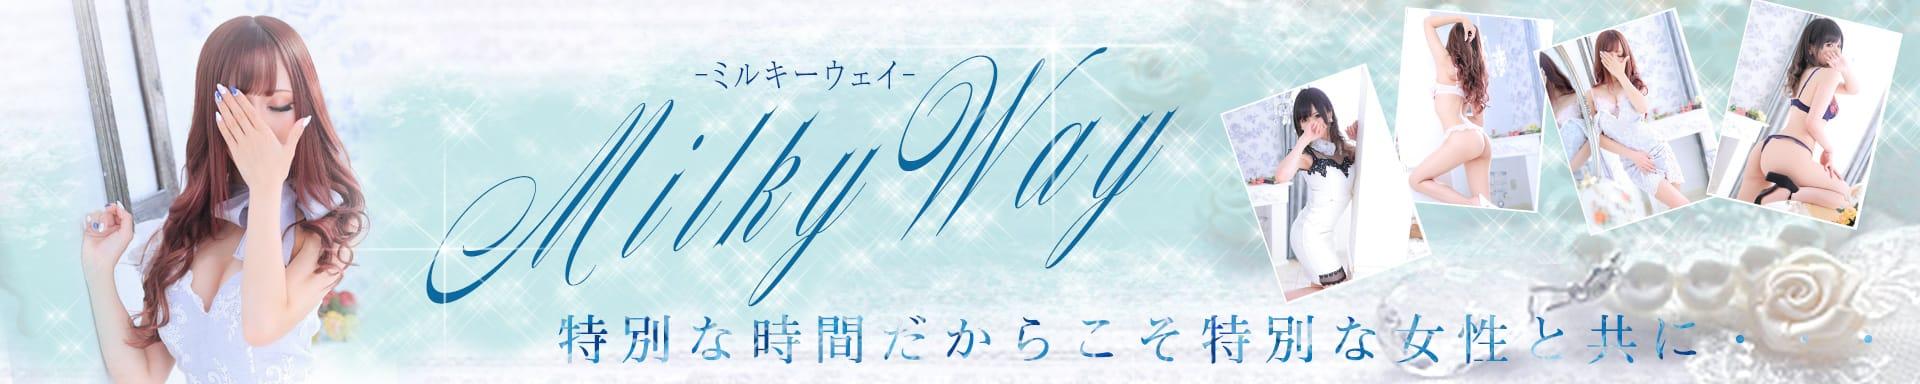 Milky Way - 金沢